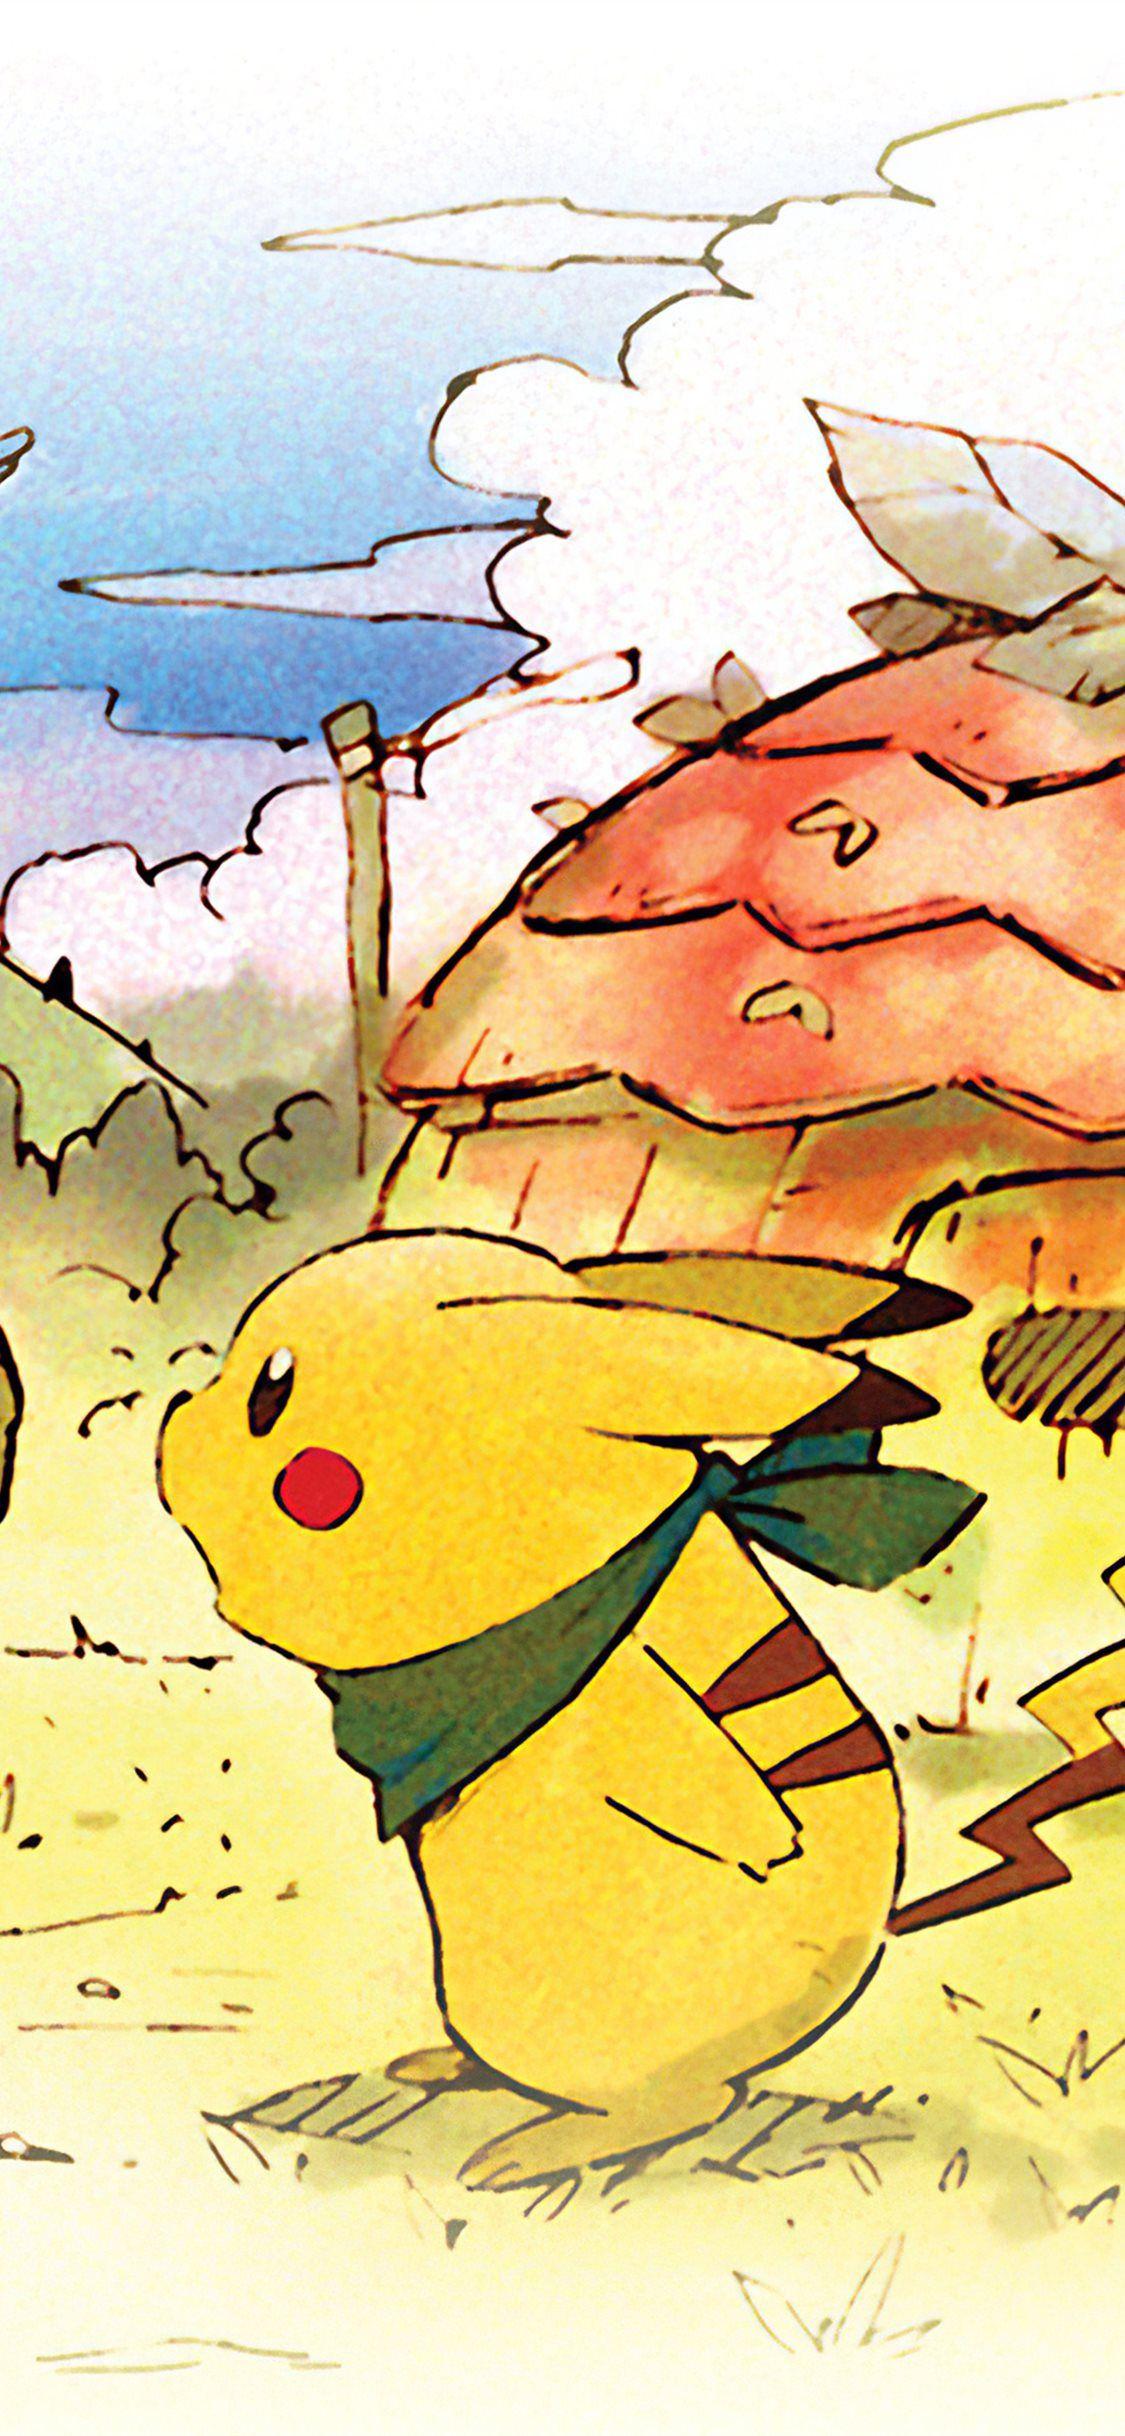 detectivepikachu wallpaper iphone pokémon pikachu